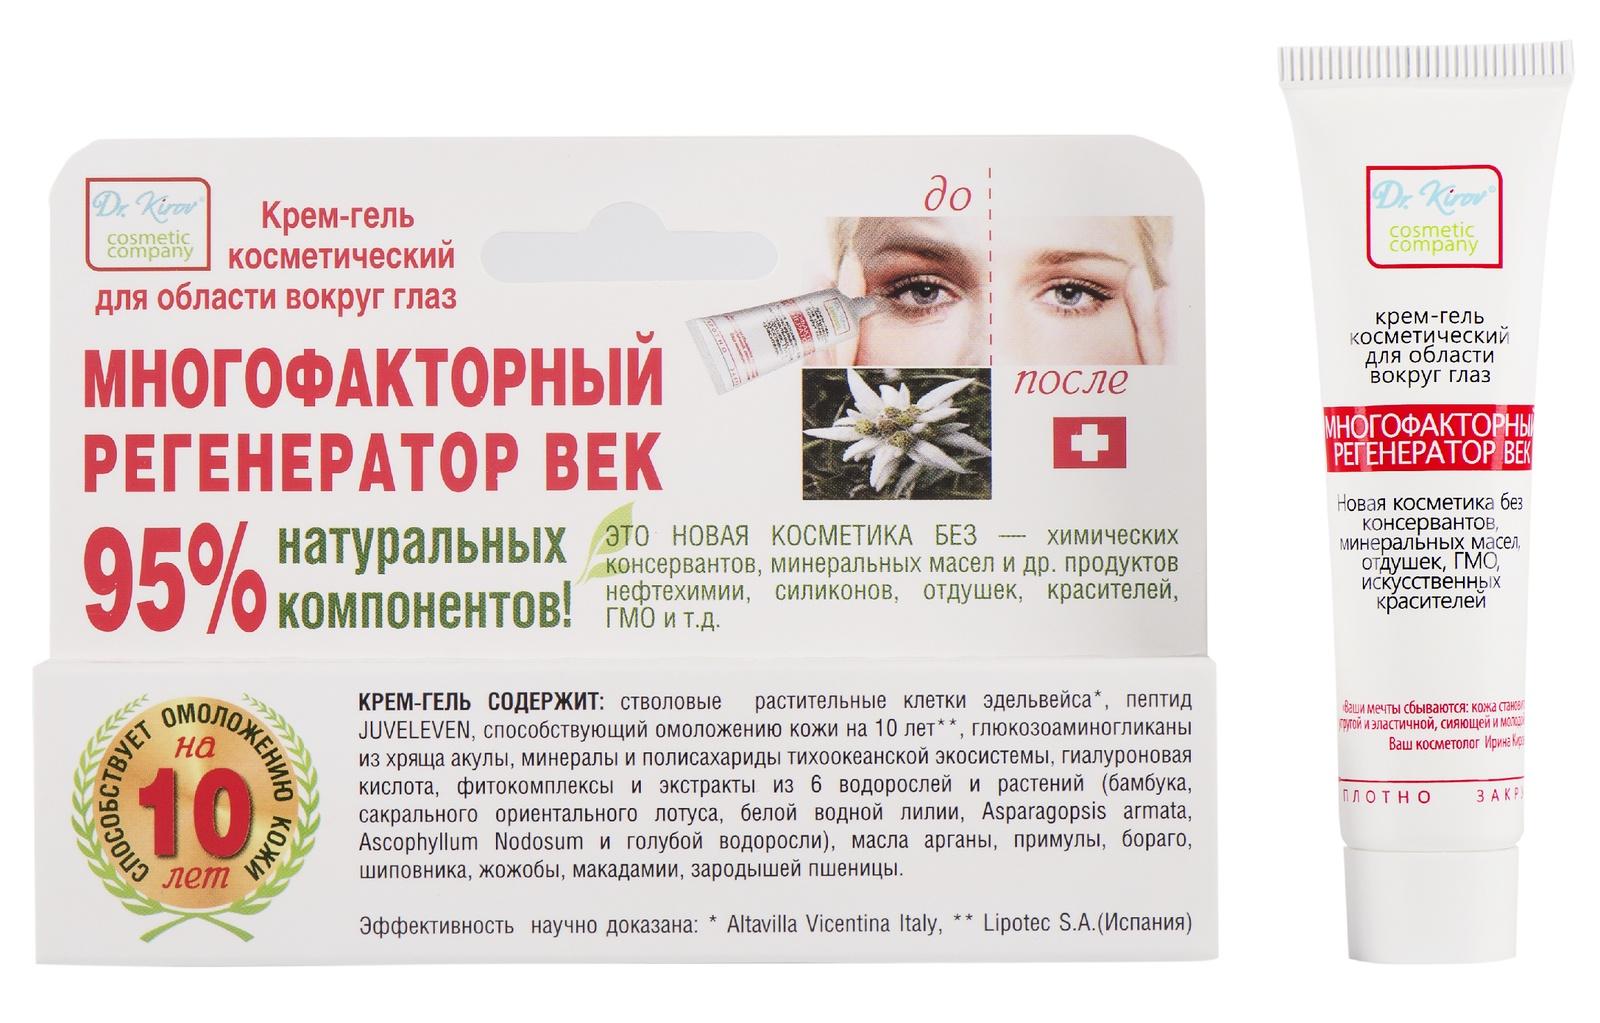 Dr. Kirov CosmeticКрем-гель